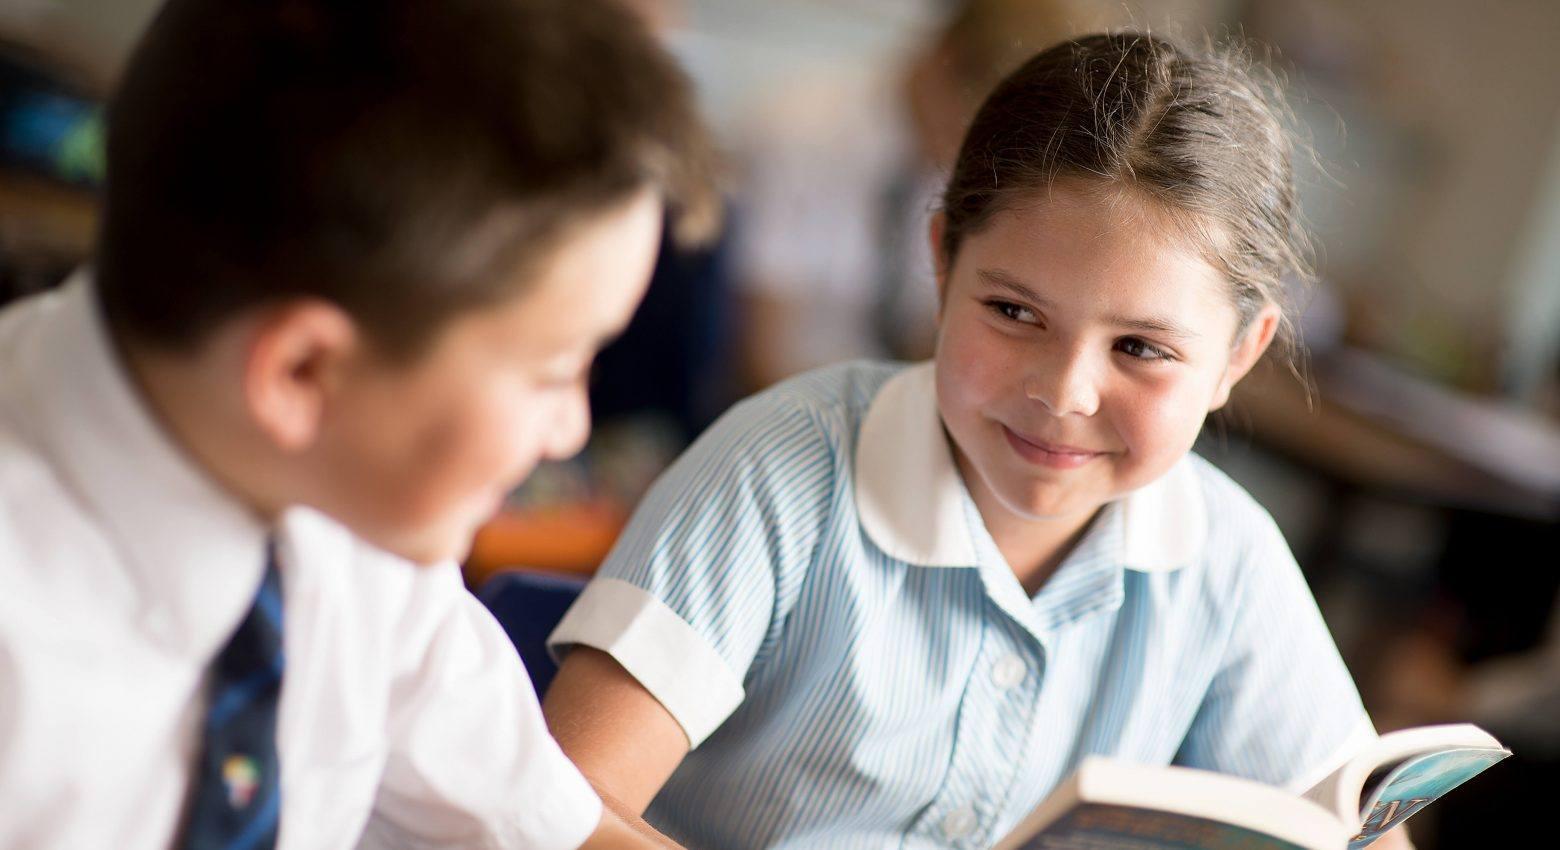 School girl reading to school boy